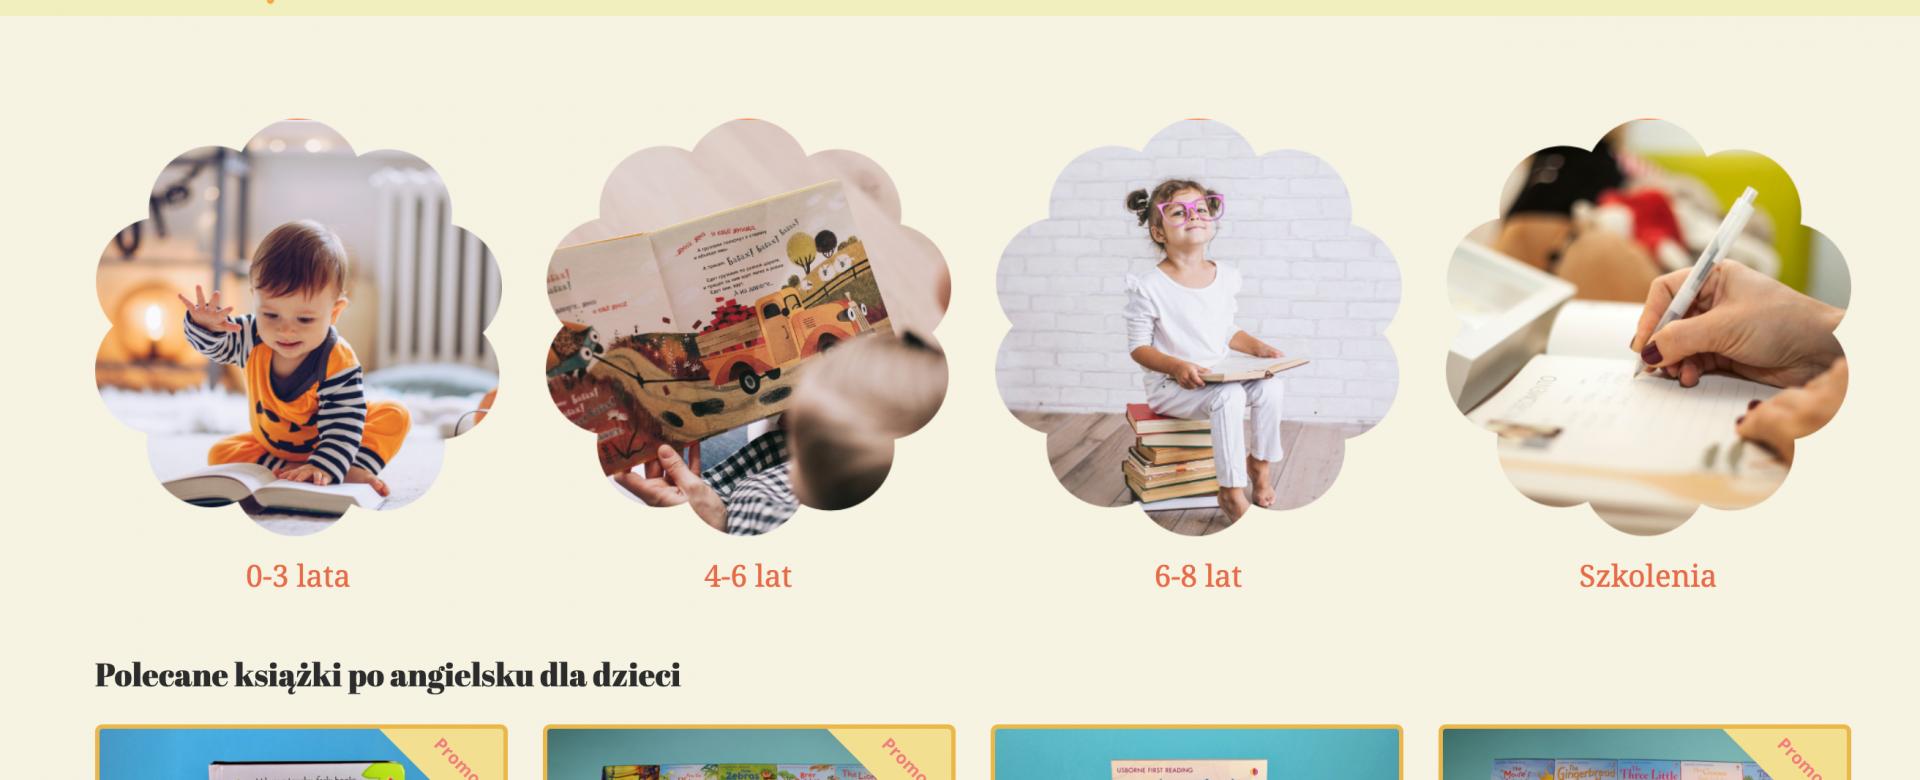 Mylibrary.com.pl